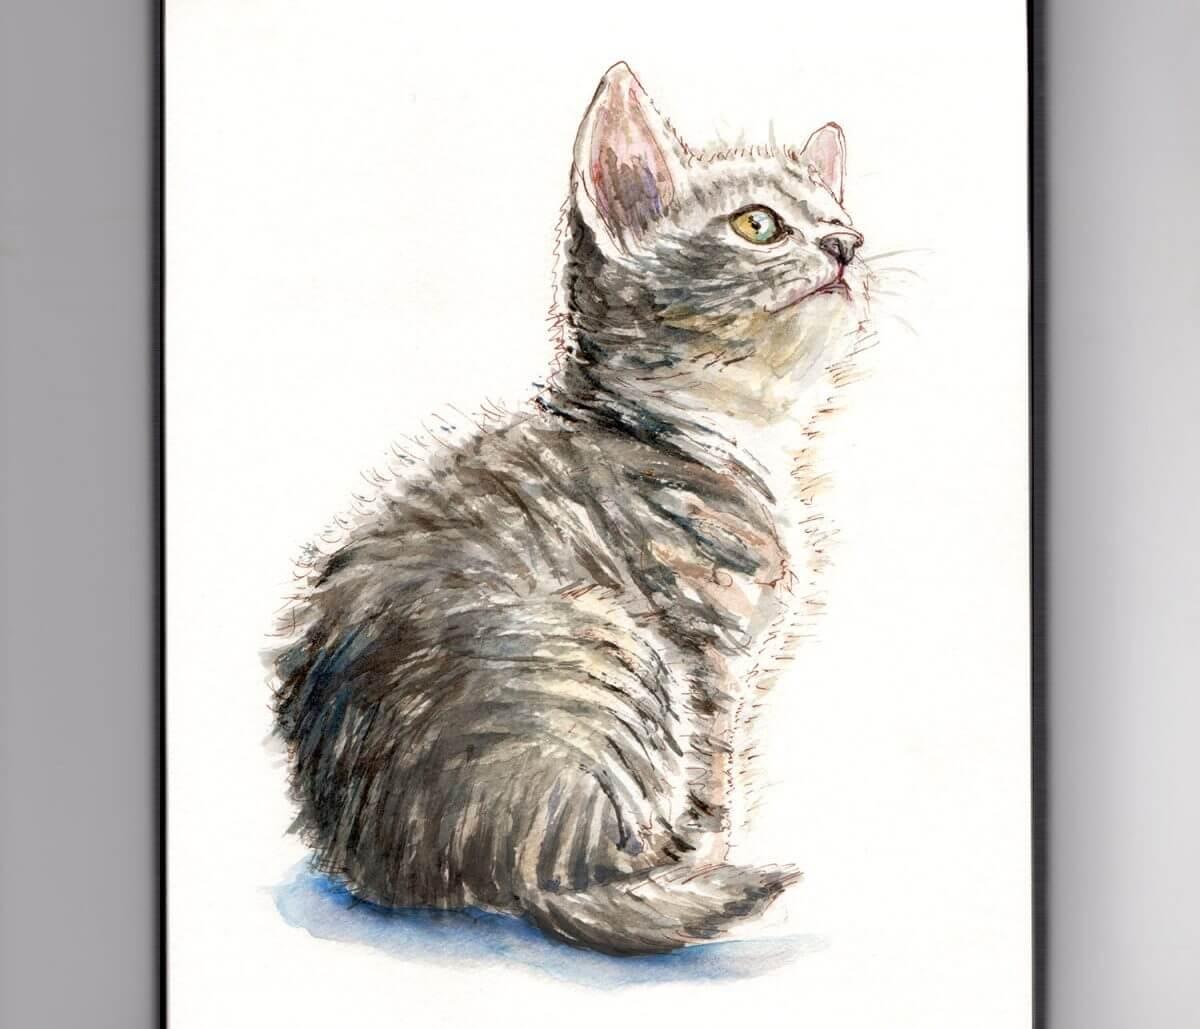 #WorldWatercolorGroup - Day 23 - A Little Cat - Doodlewash